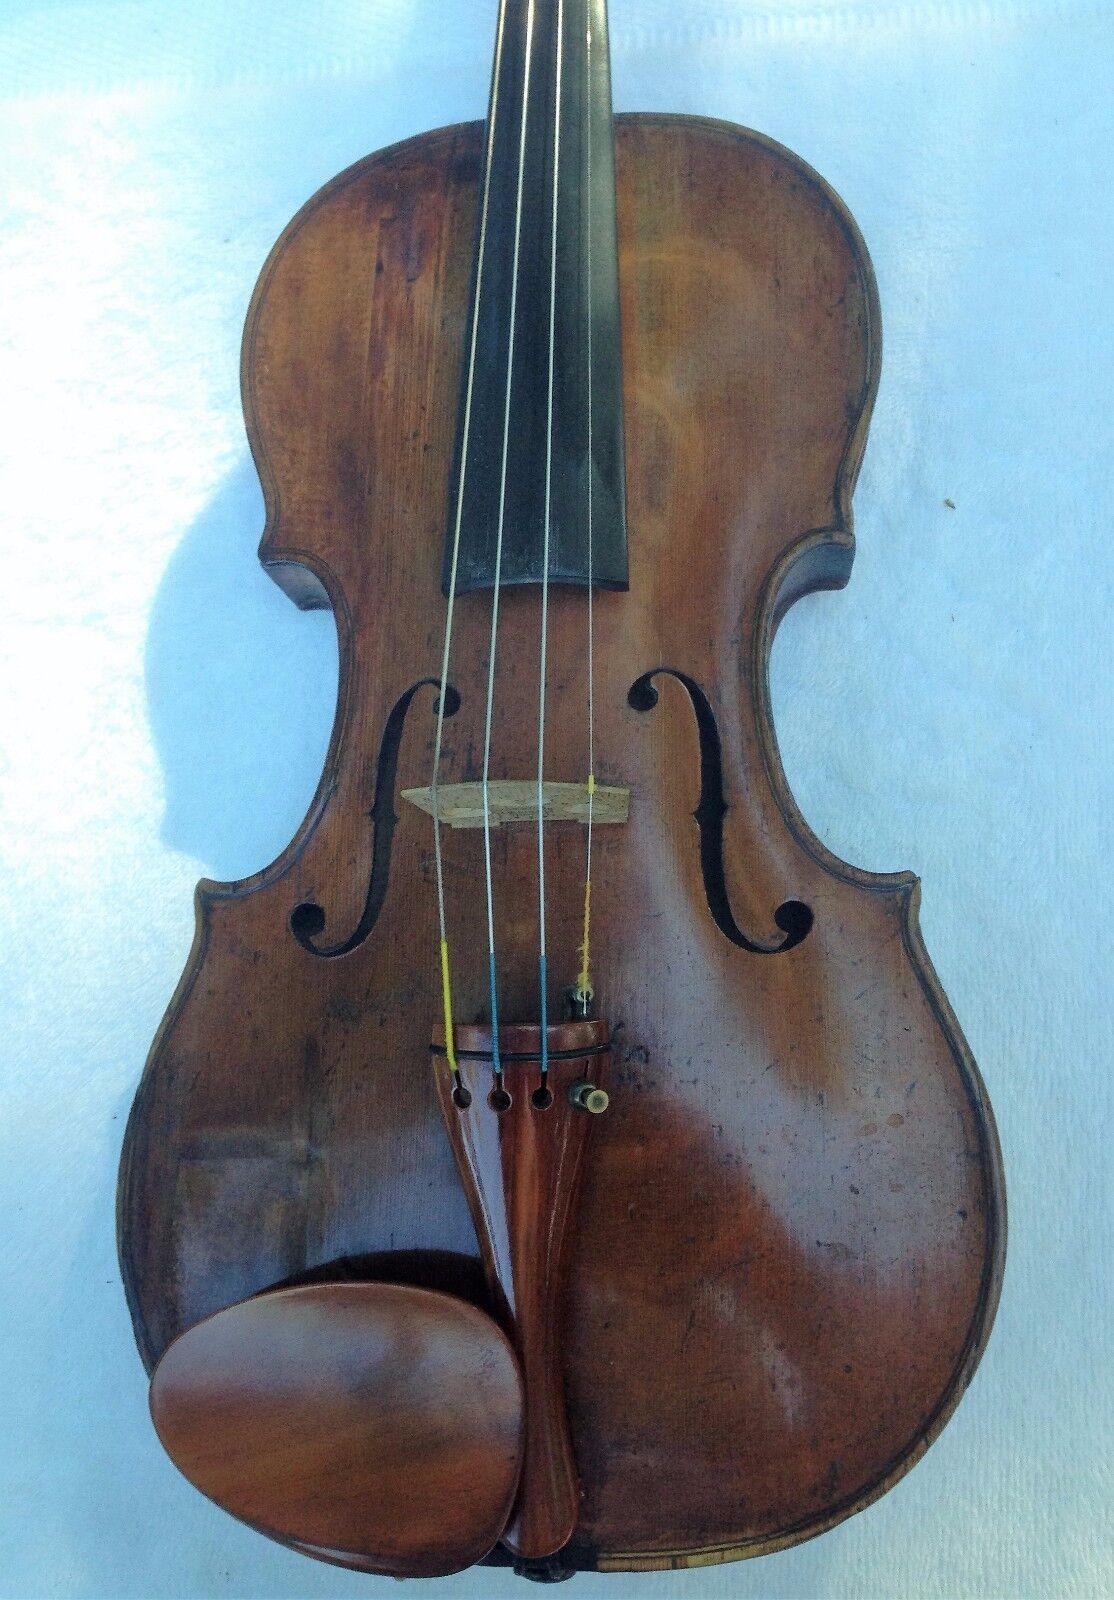 Muy Fino violín violín violín francés Francois Vuillaume  de moda